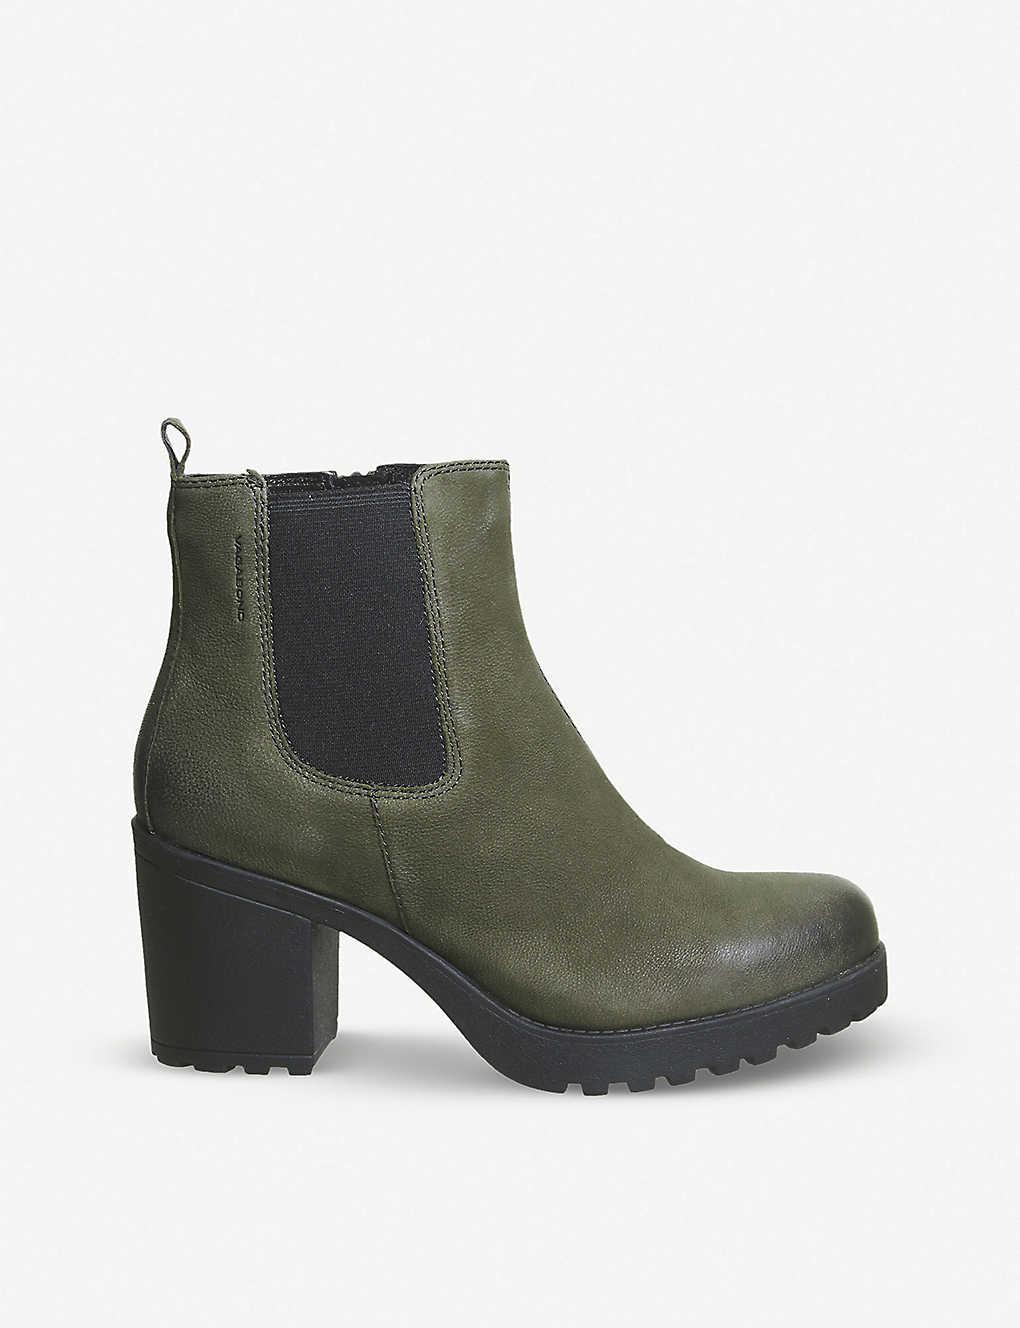 0d97db9ce20b Grace heeled leather chelsea boot - Dark olive nubuick ...